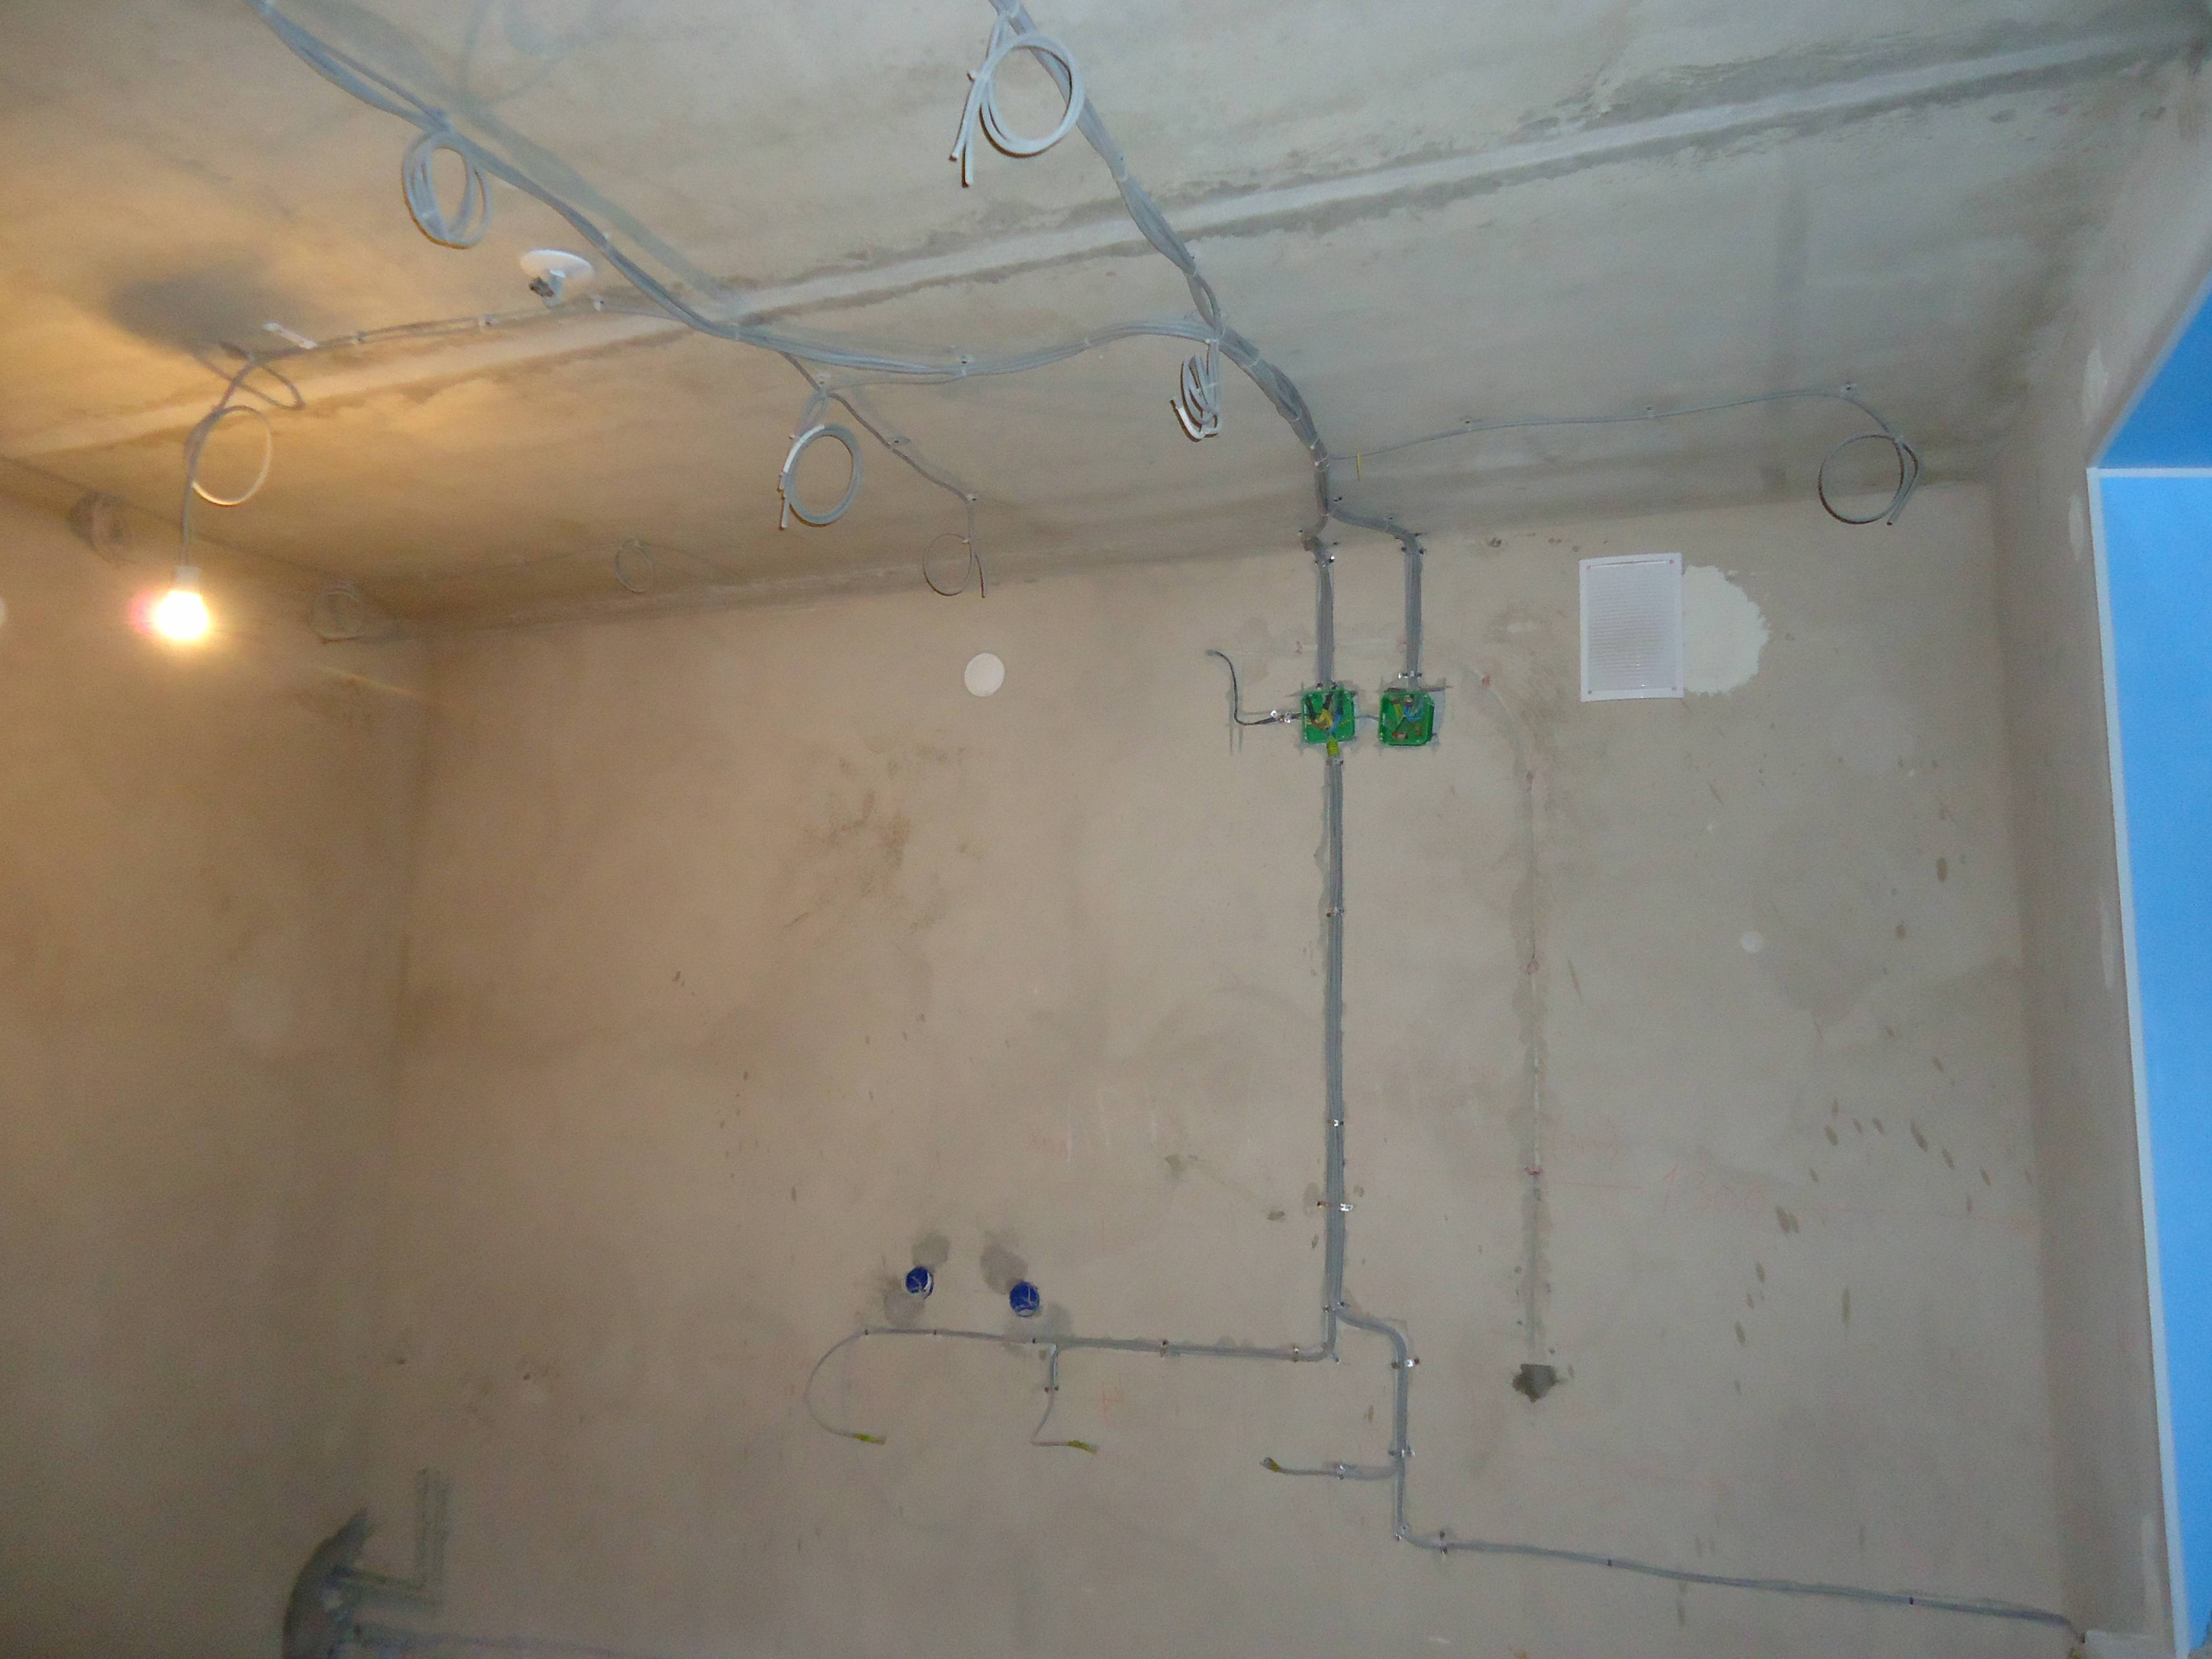 Электромонтаж проводки в квартире своими руками 5522